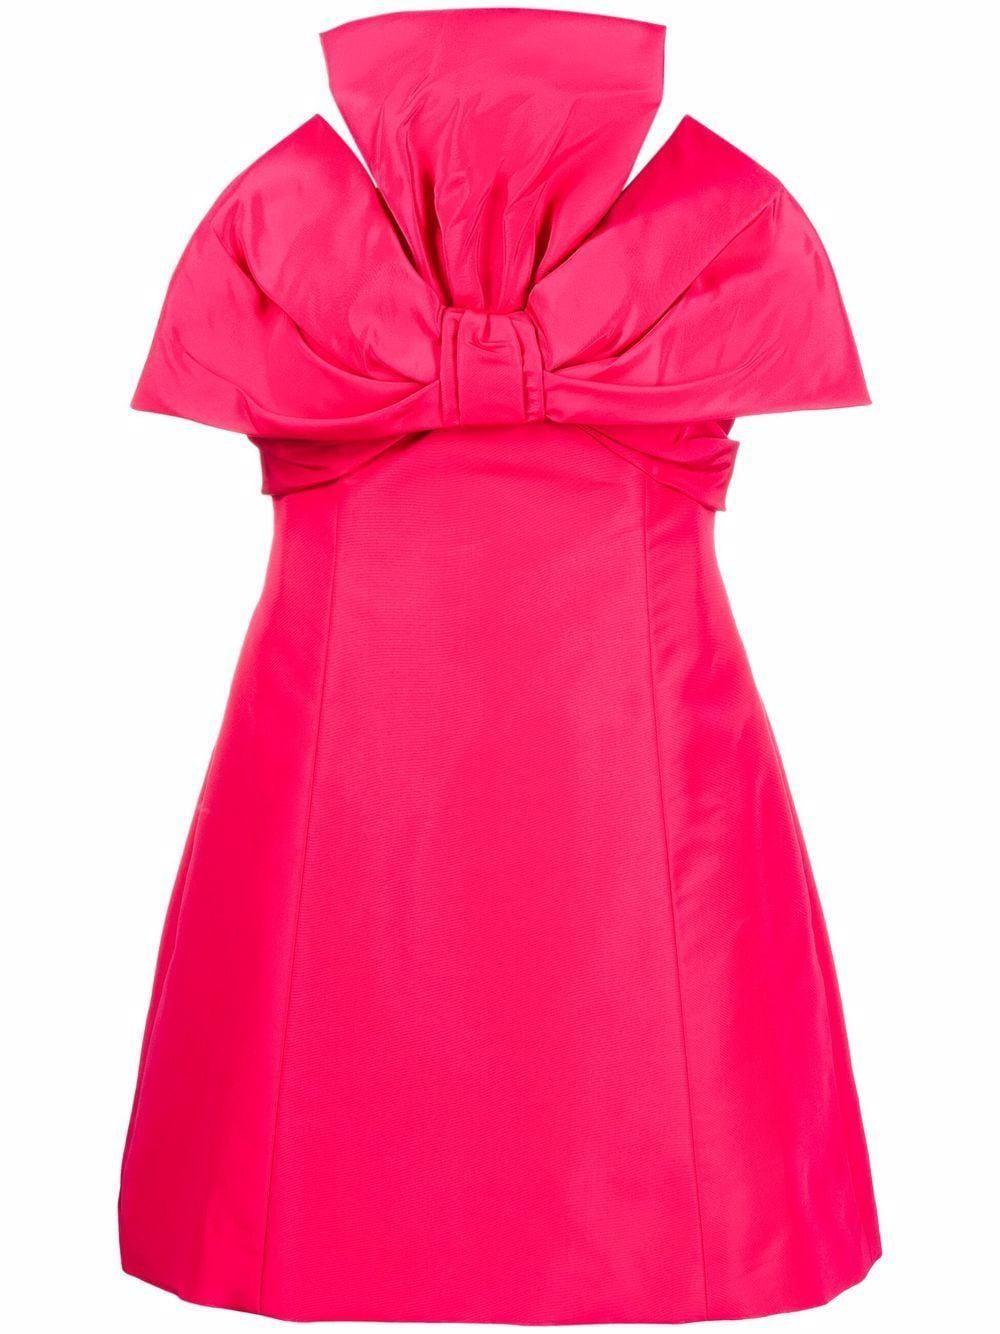 Ruched Sleeveless Mini Dress